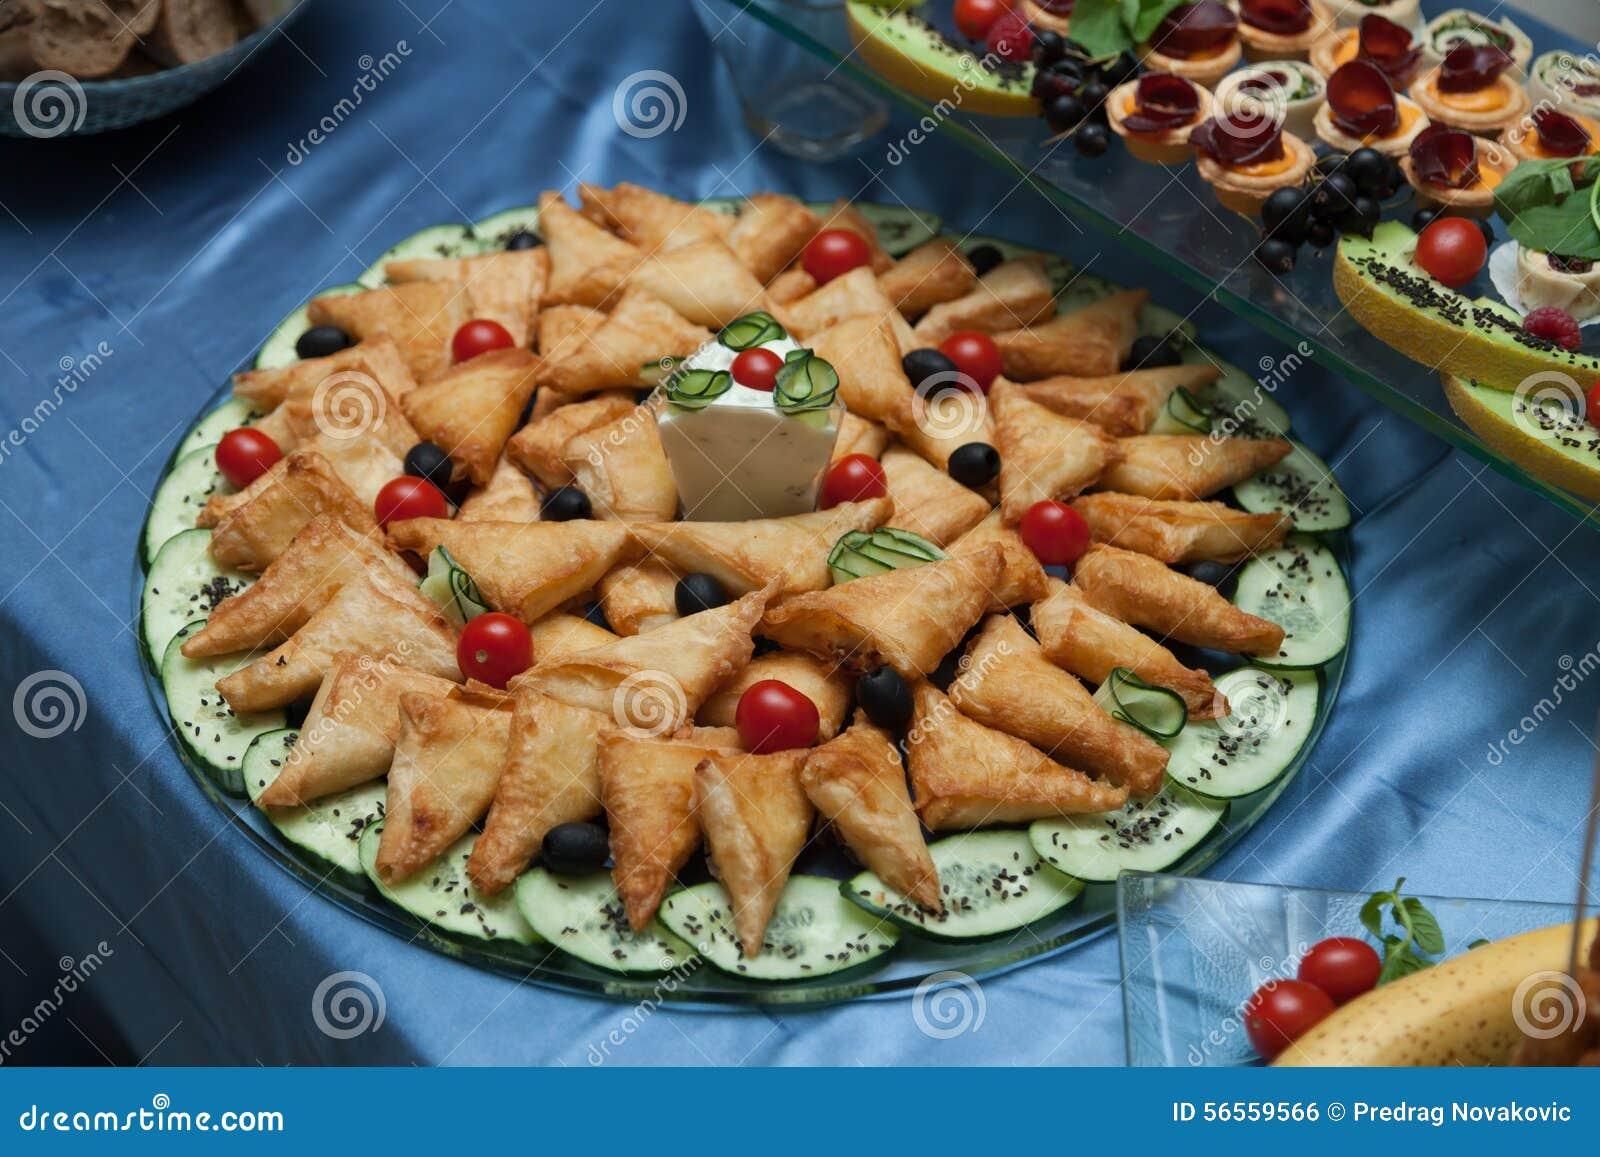 Download εύγευστα τρόφιμα στοκ εικόνες. εικόνα από κρέμα, foreground - 56559566